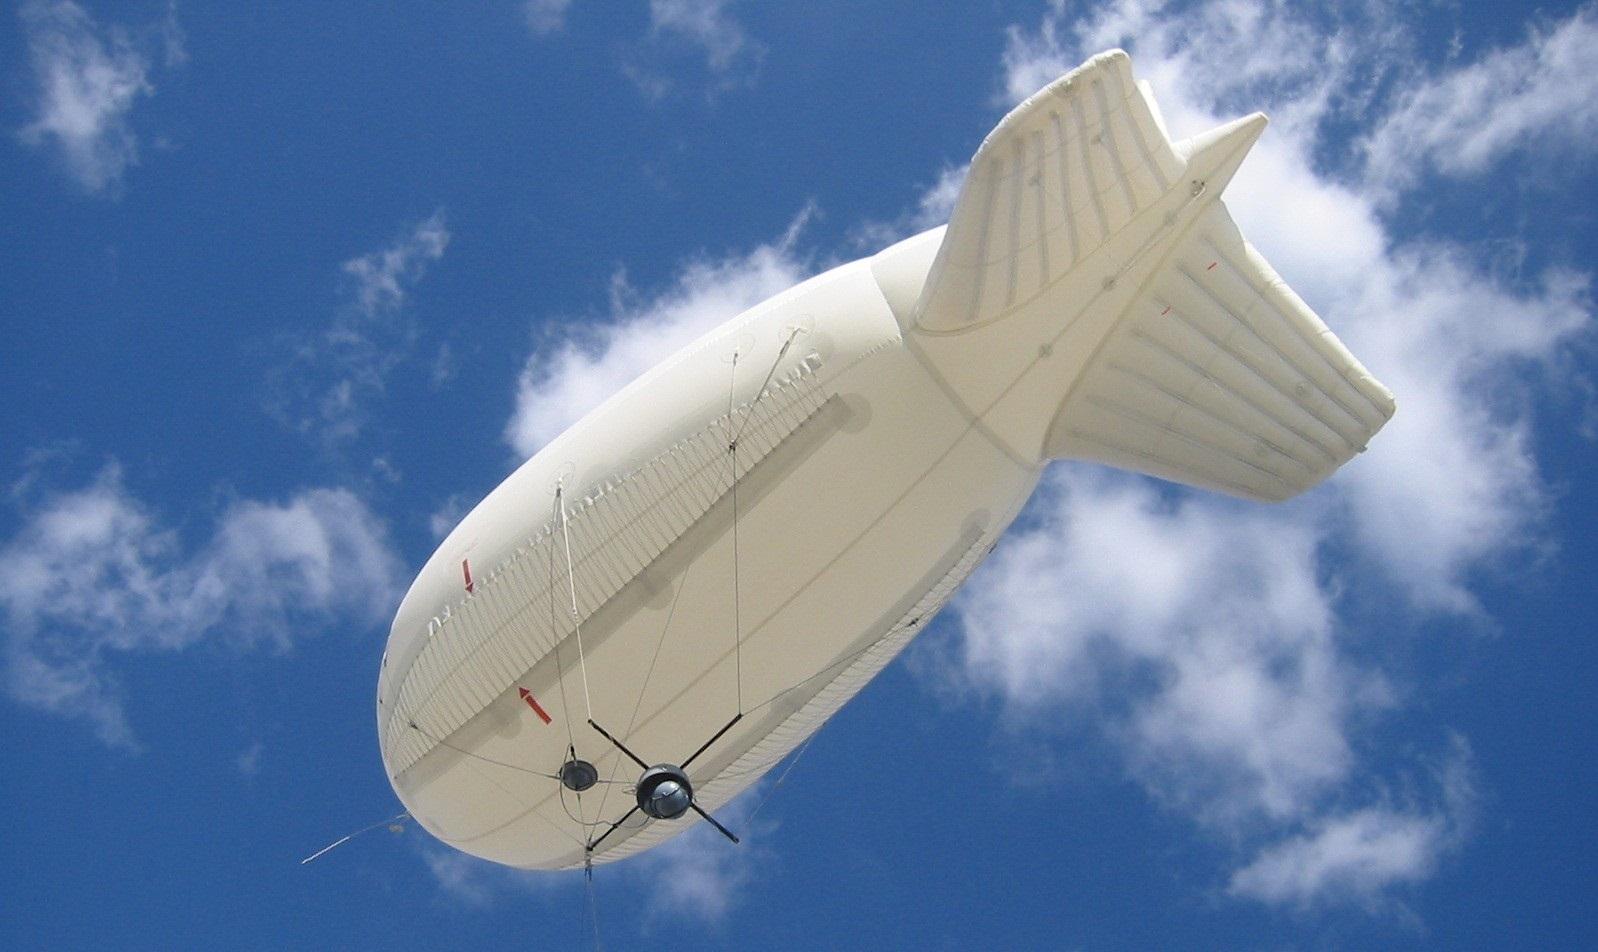 Raven Industries Aerostat blimp in the sky as seen from below.